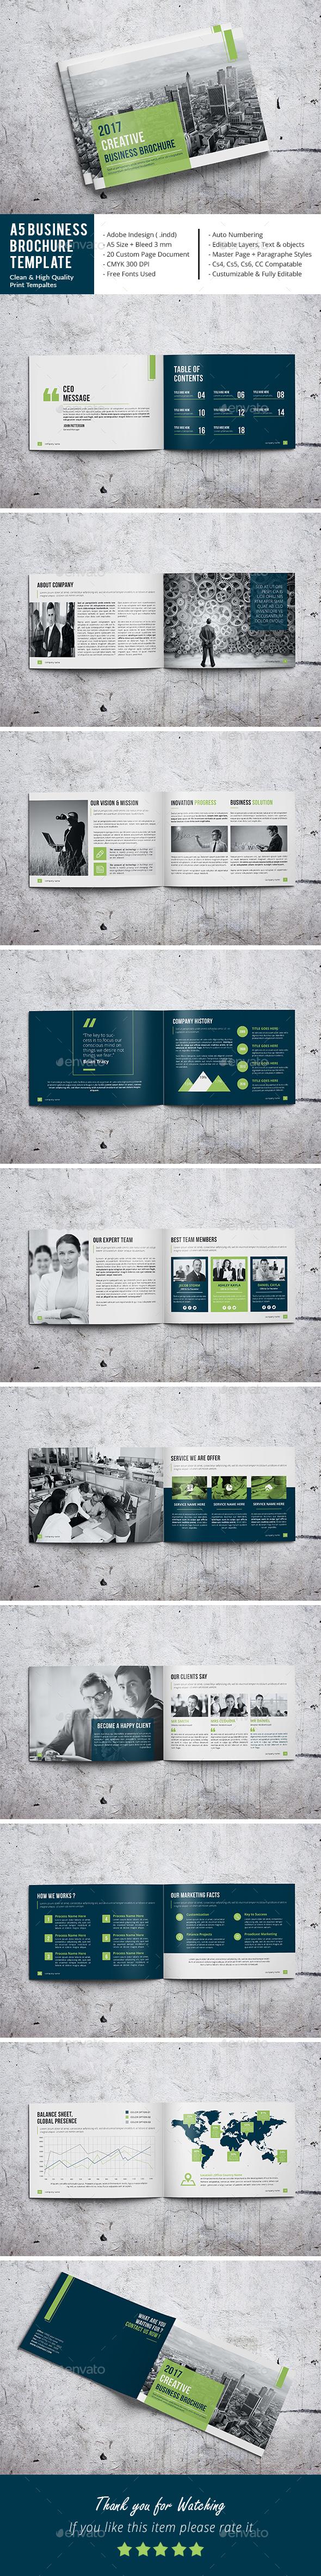 A5 Business Brochure Template - Corporate Brochures